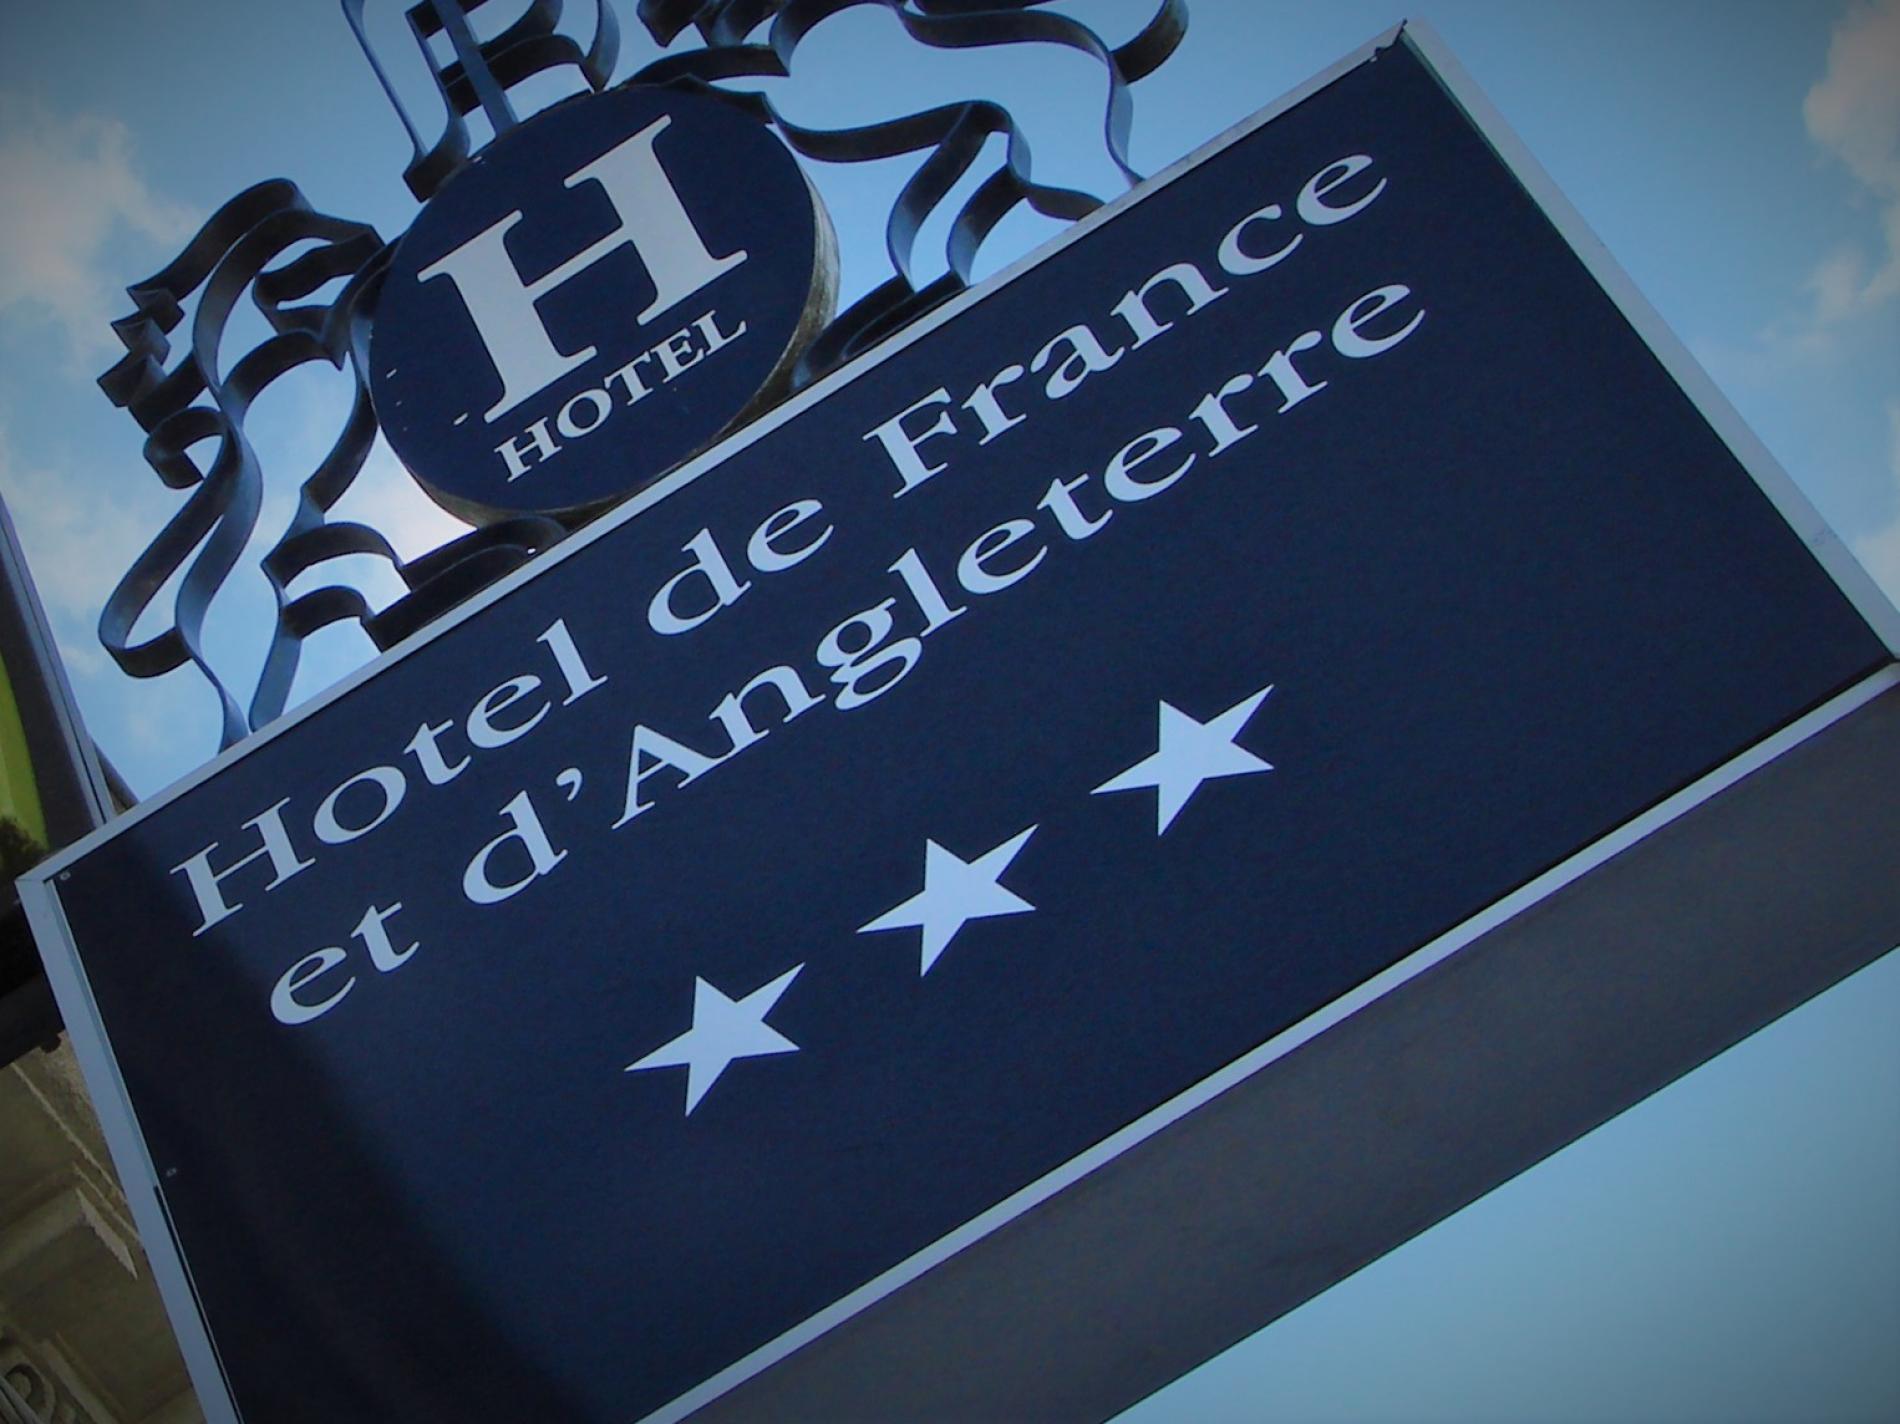 Hôtel de France et d'Angleterre